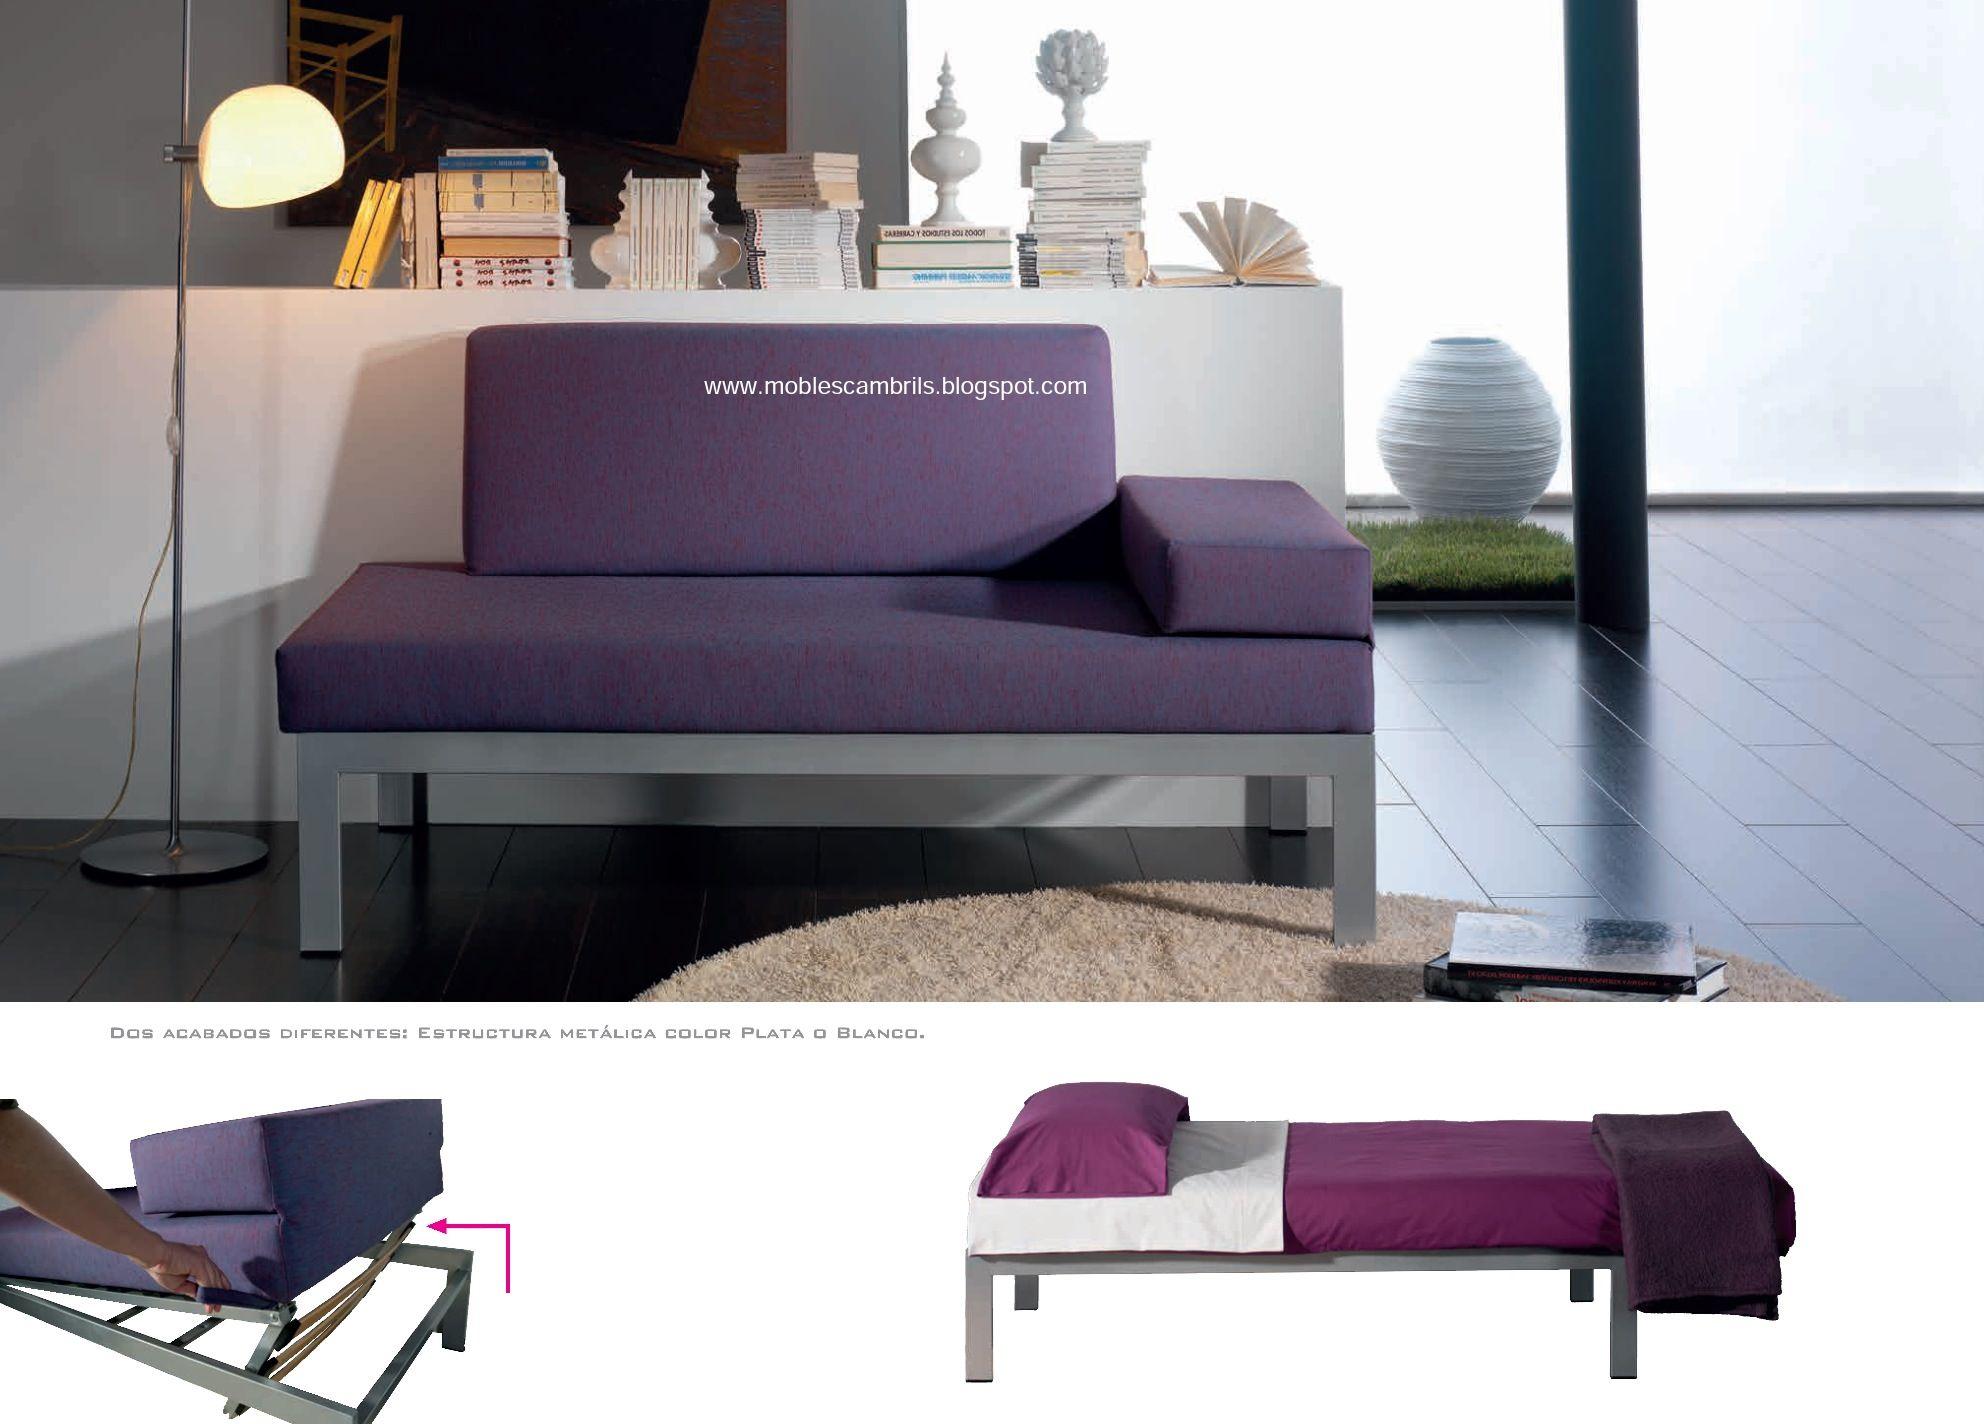 Sof cama modelo galileo individual e ideal para despachos dormitorios juveniles gimnasios - Sofa dormitorio ...